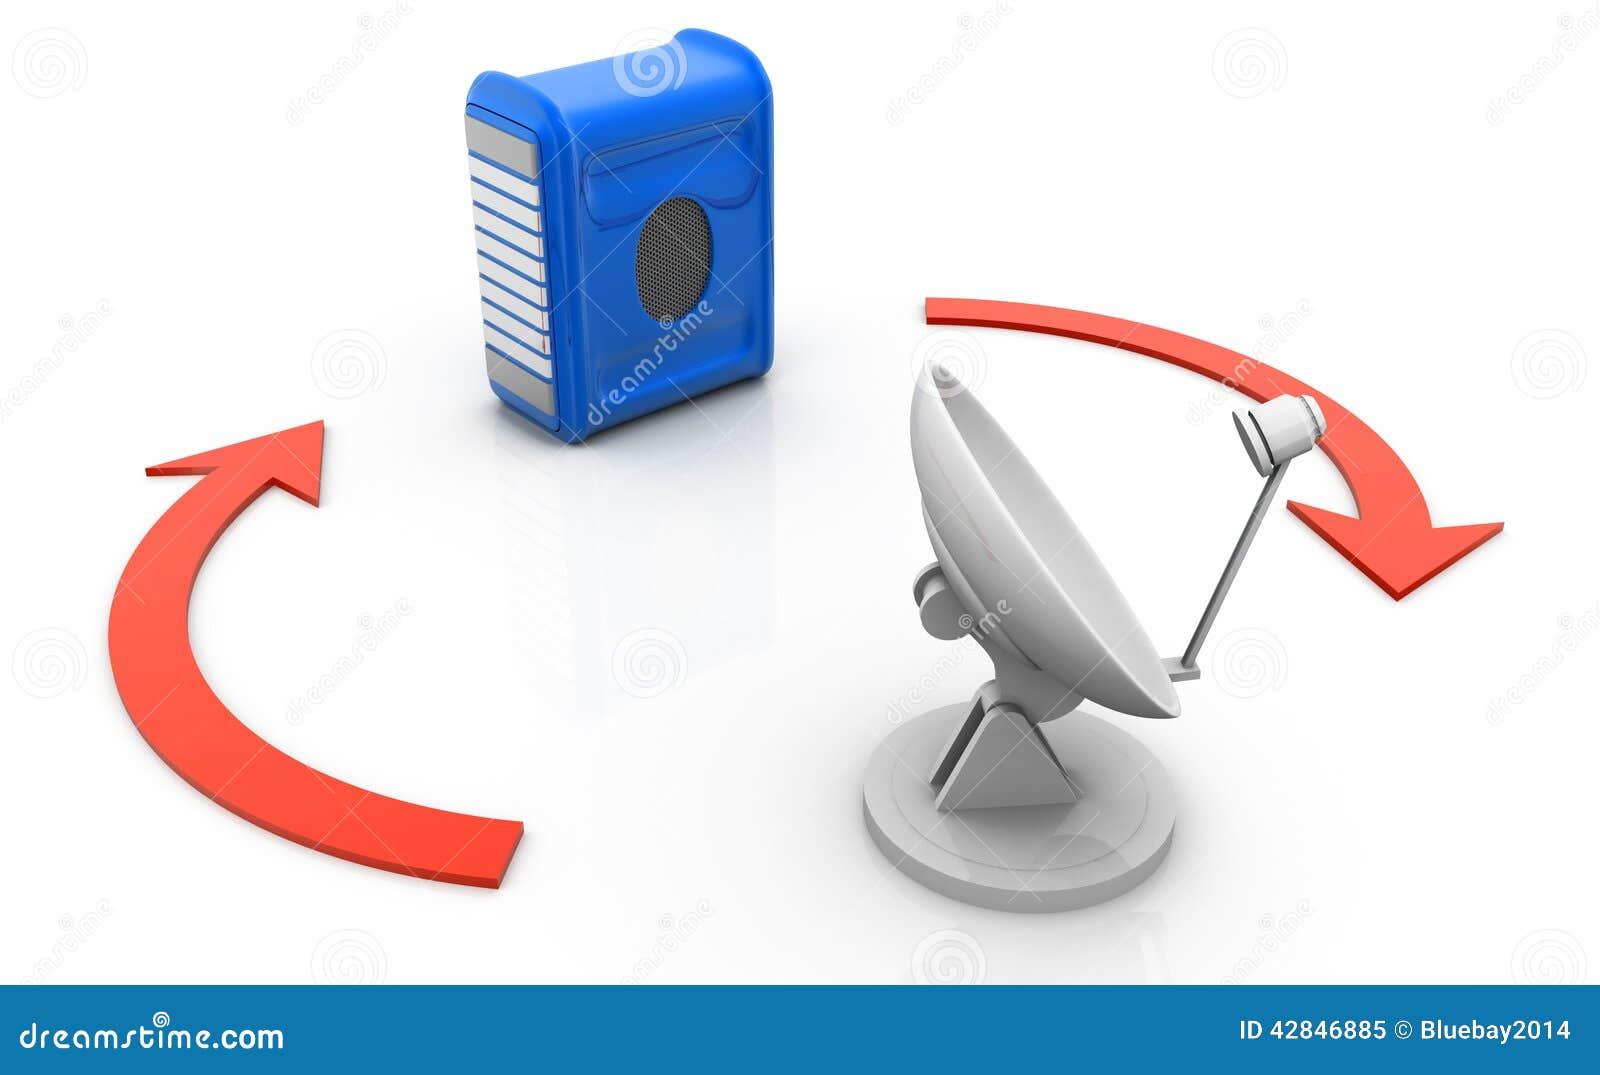 Computer Server connected via satellite dish